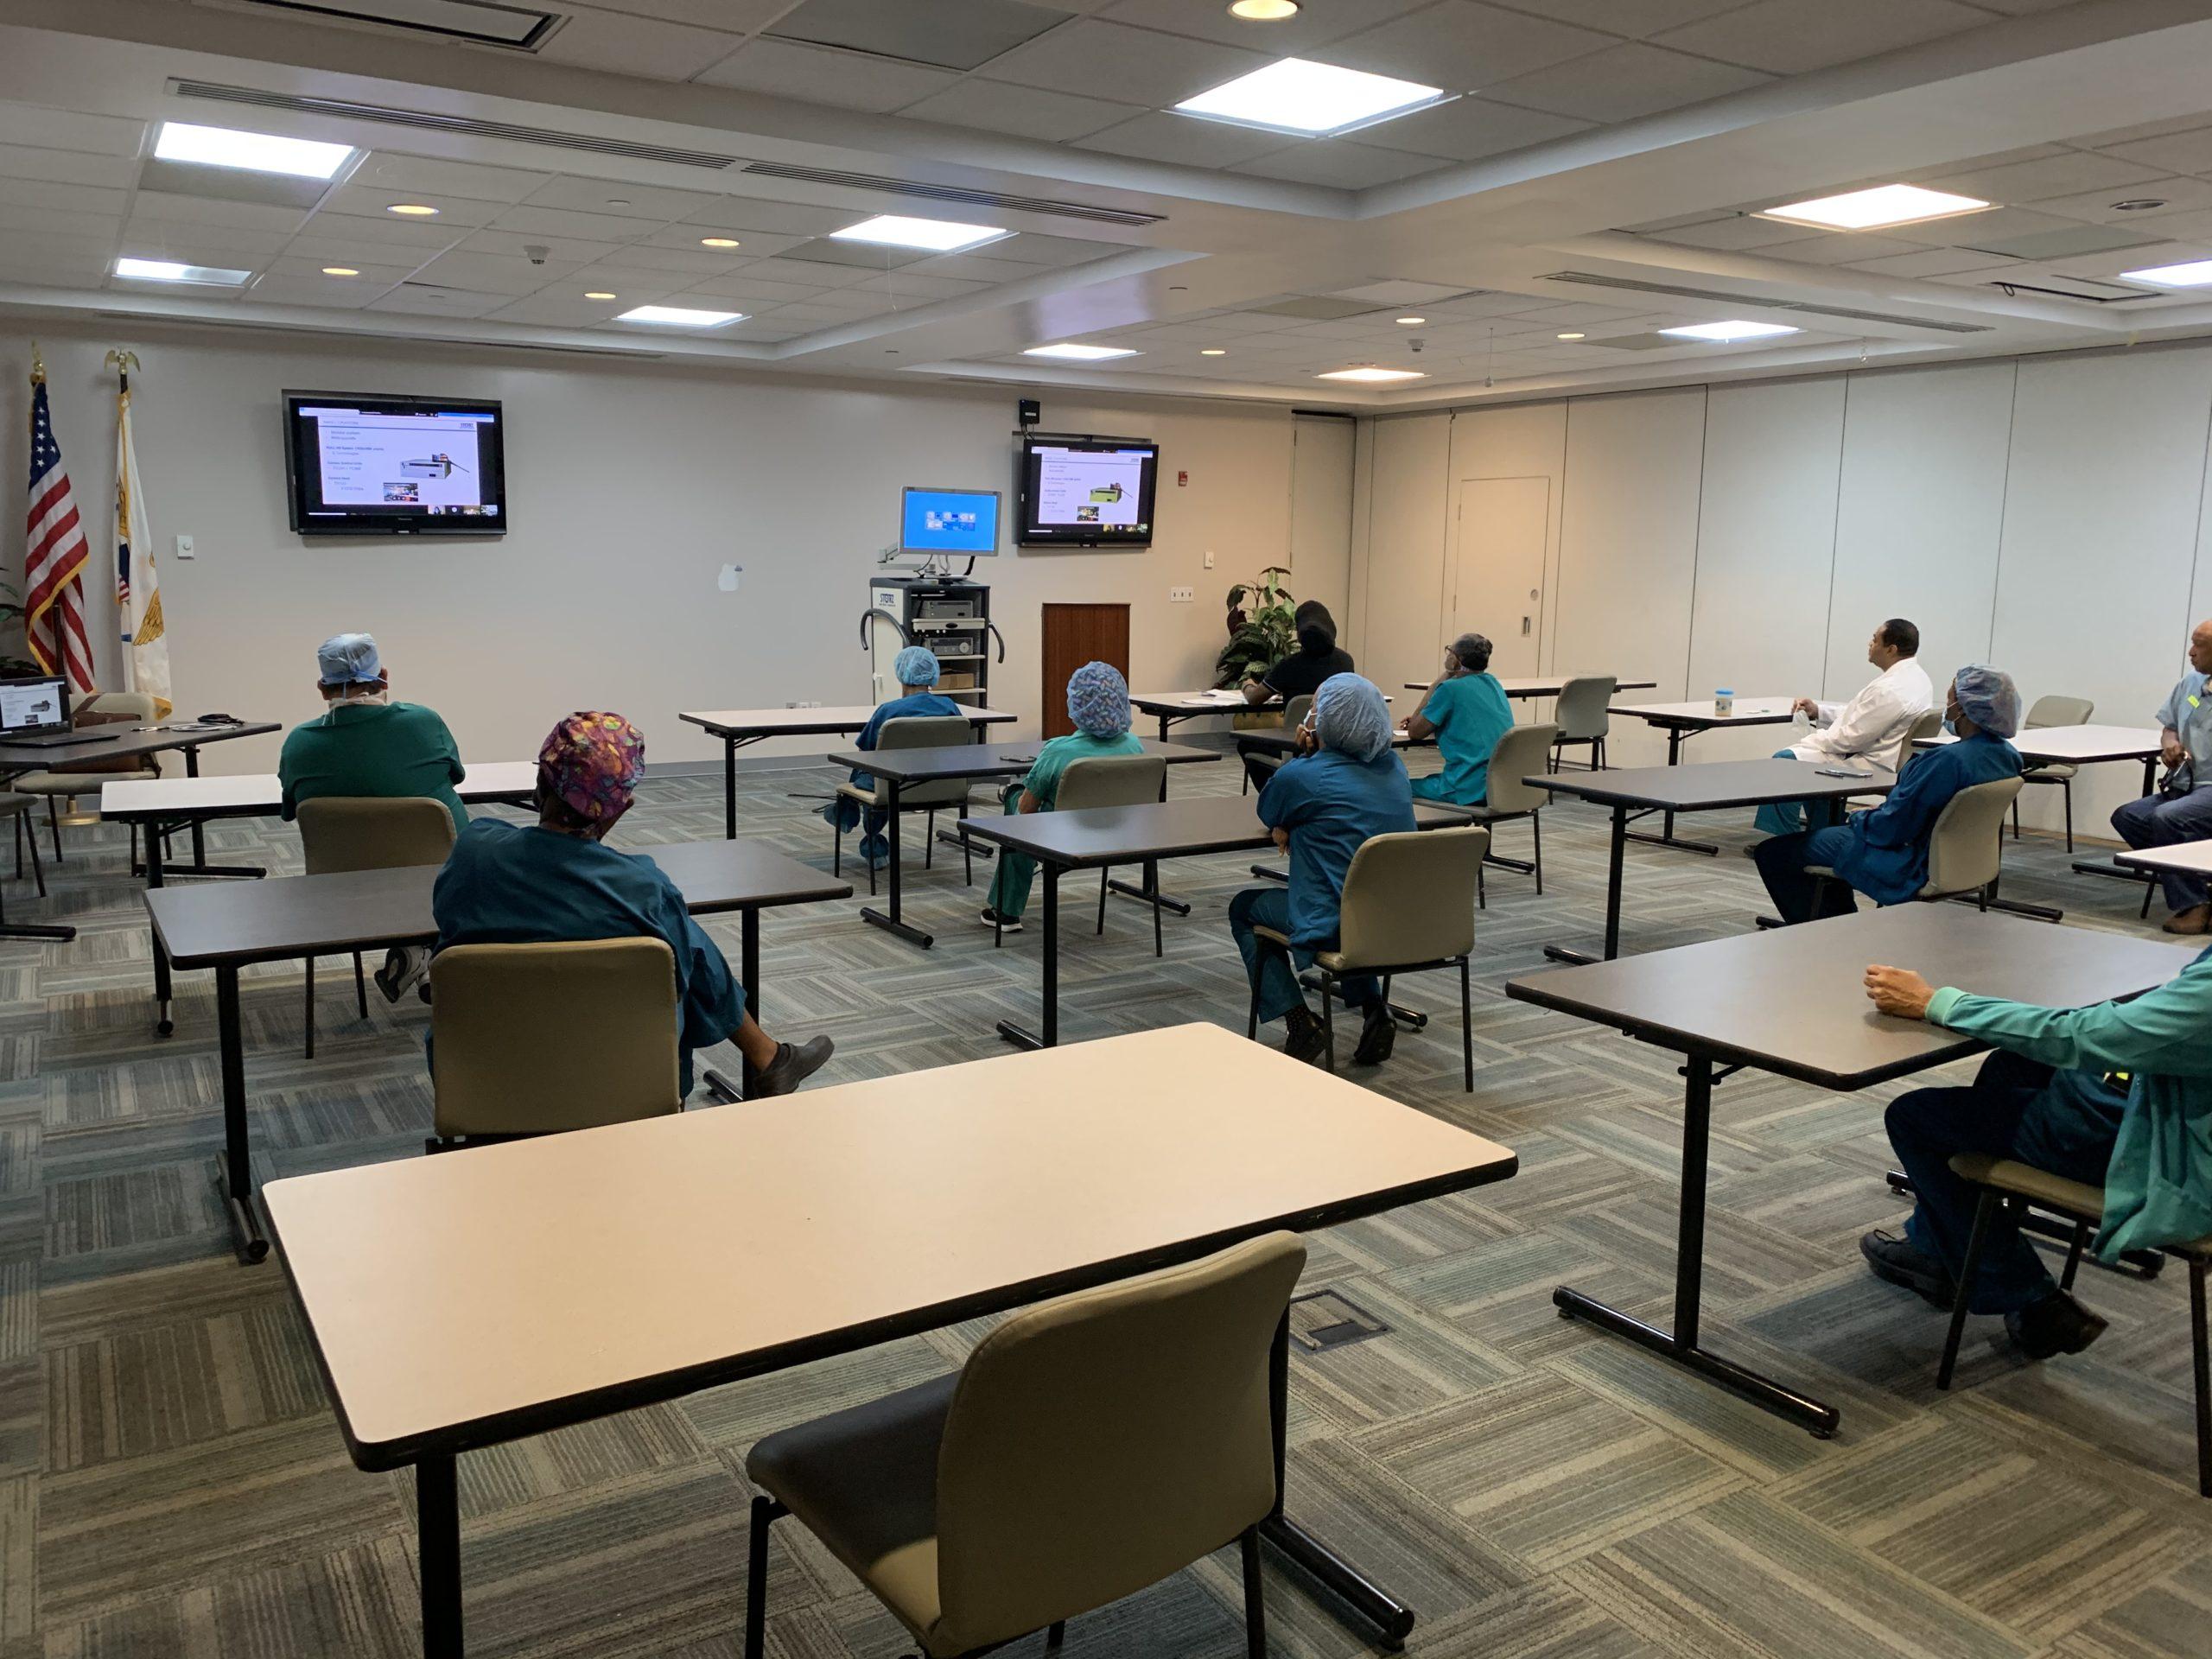 Elective Surgeries and Outpatient Procedures Return to JFL Hospital